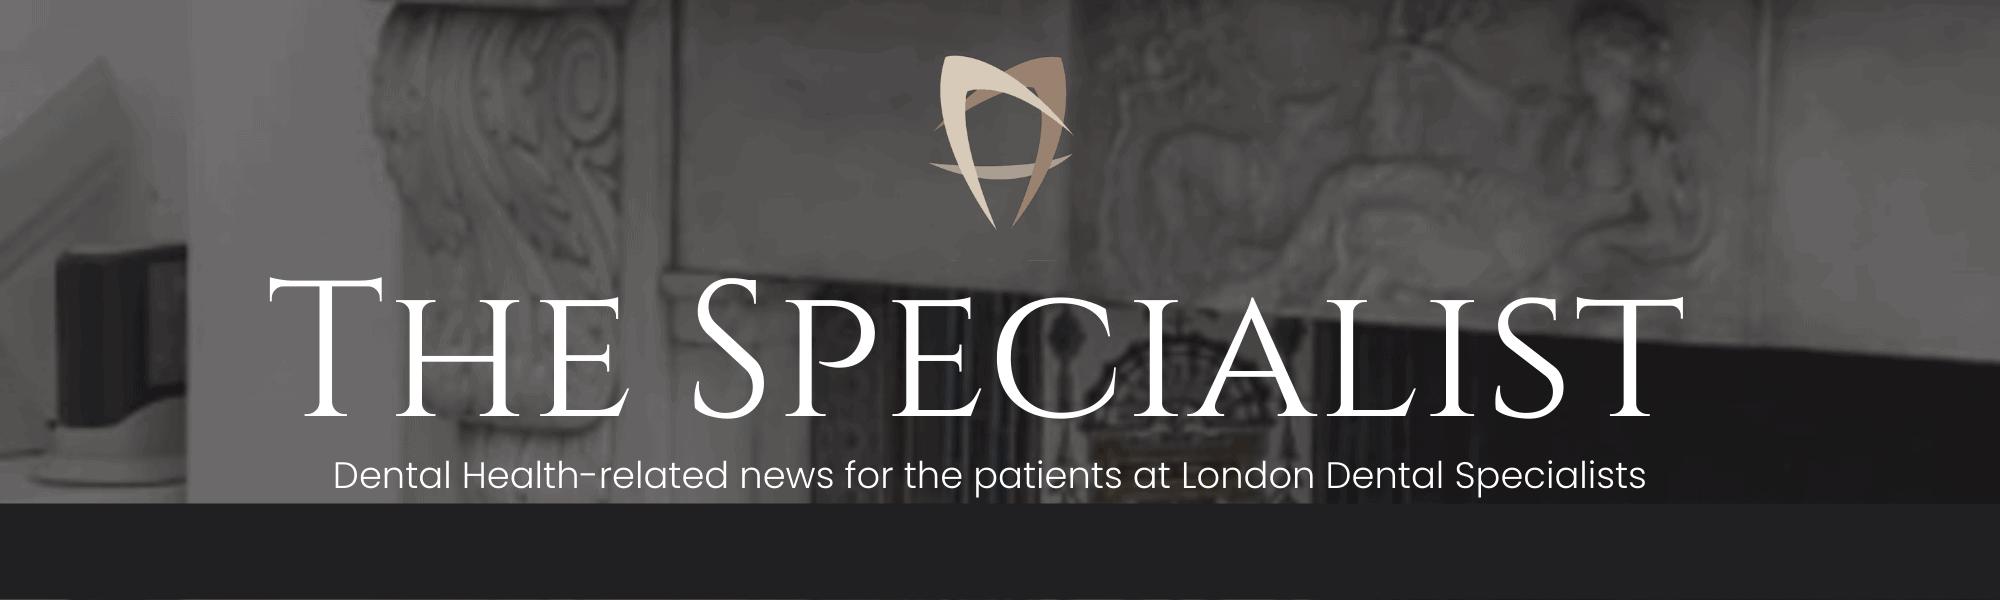 the specialist lds dental newsletter september